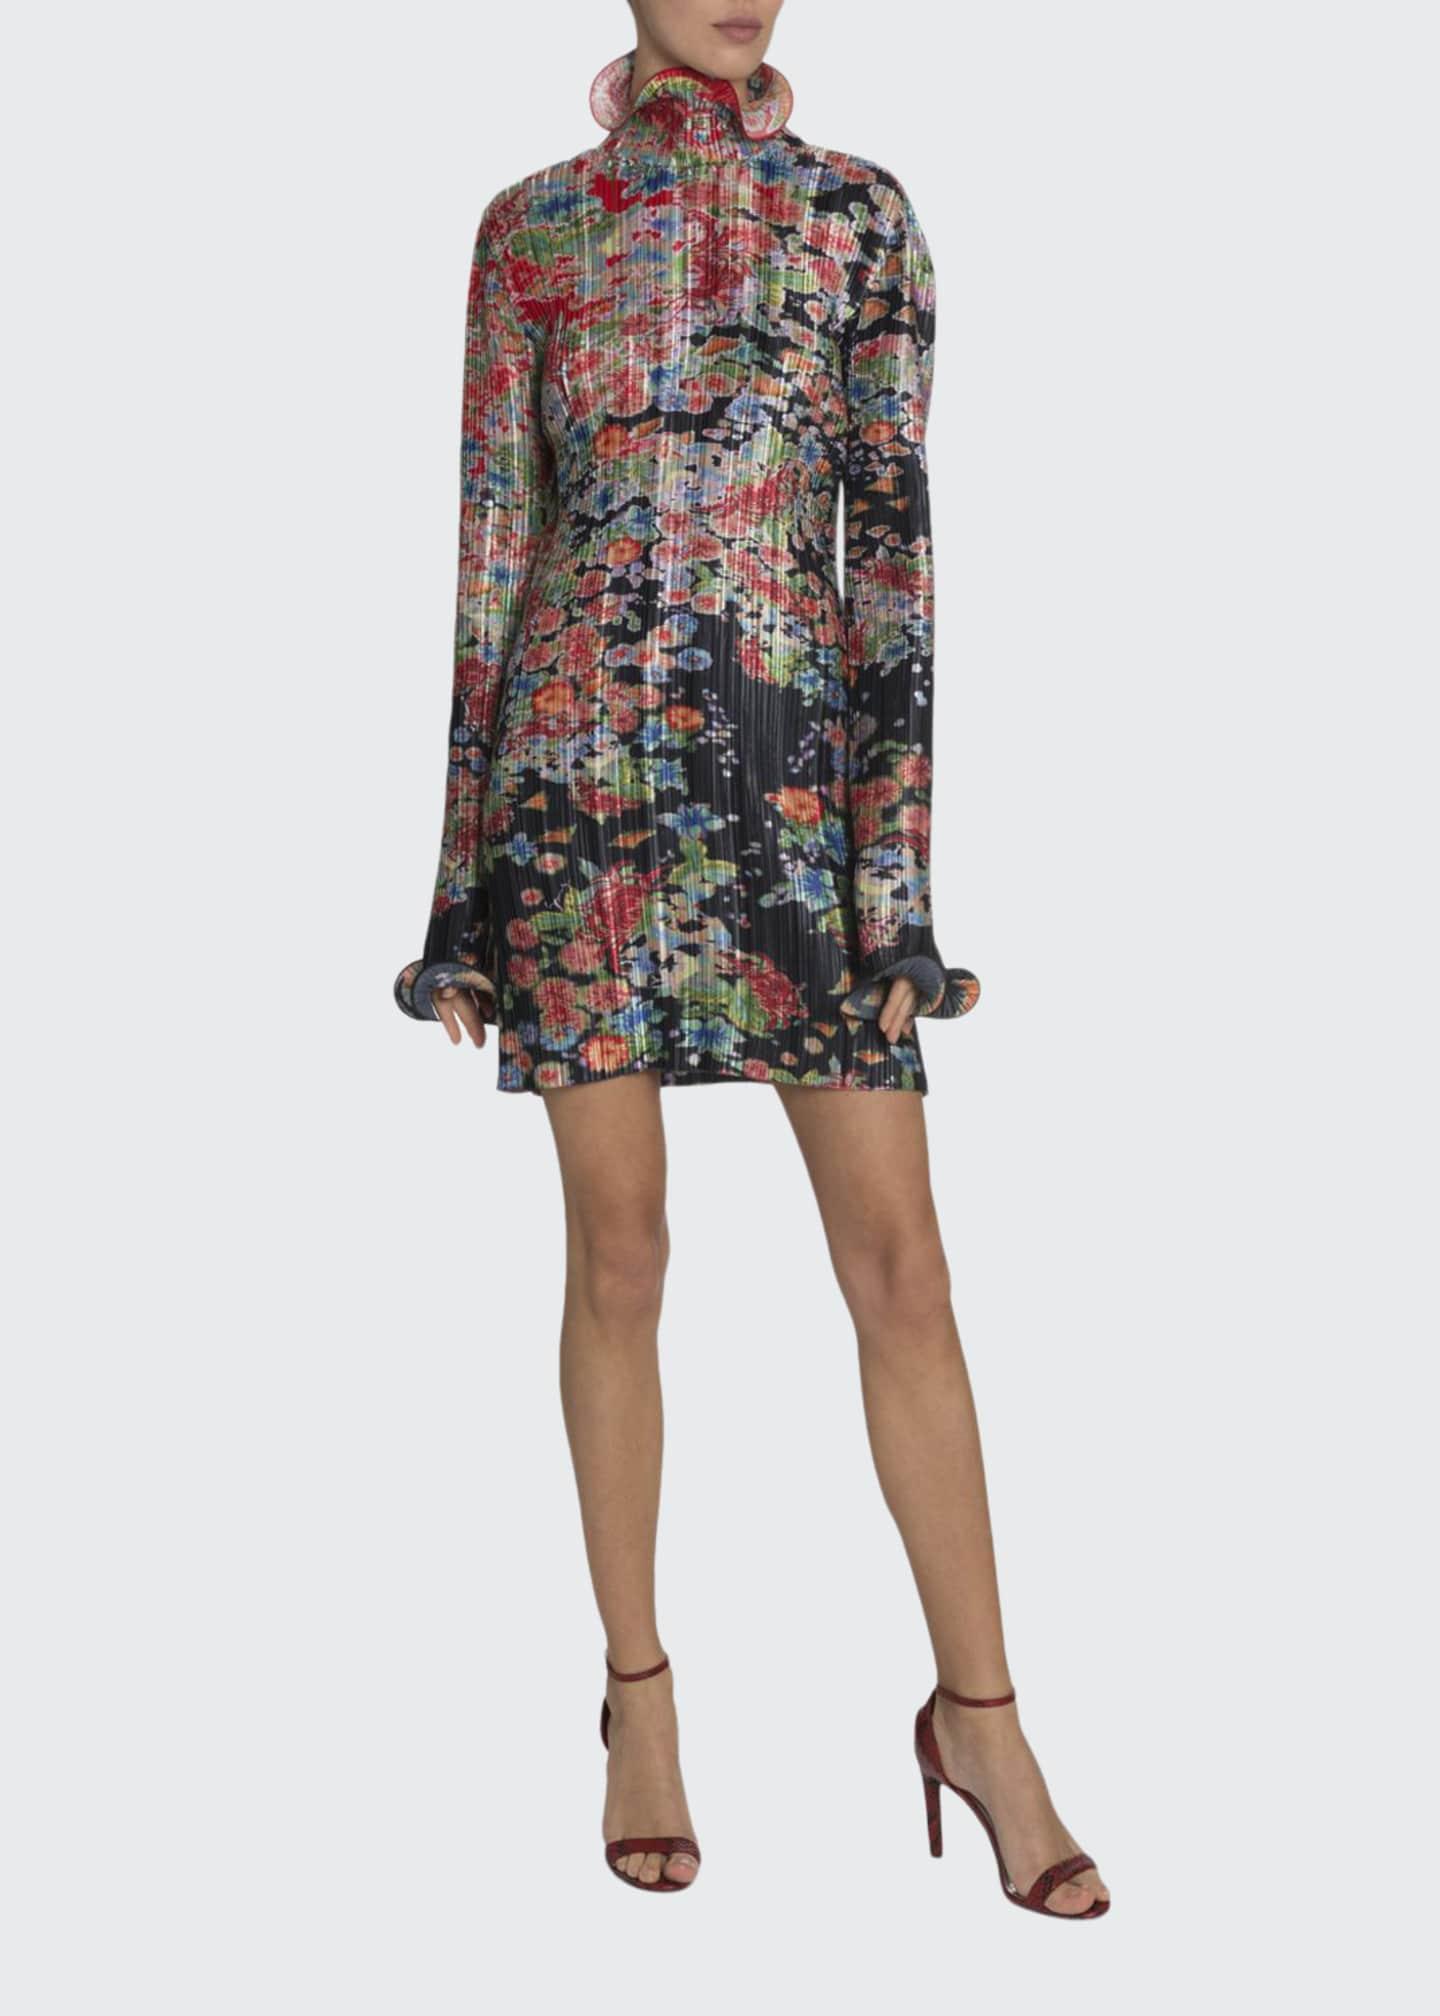 Givenchy Metallic Floral Plisse Dress